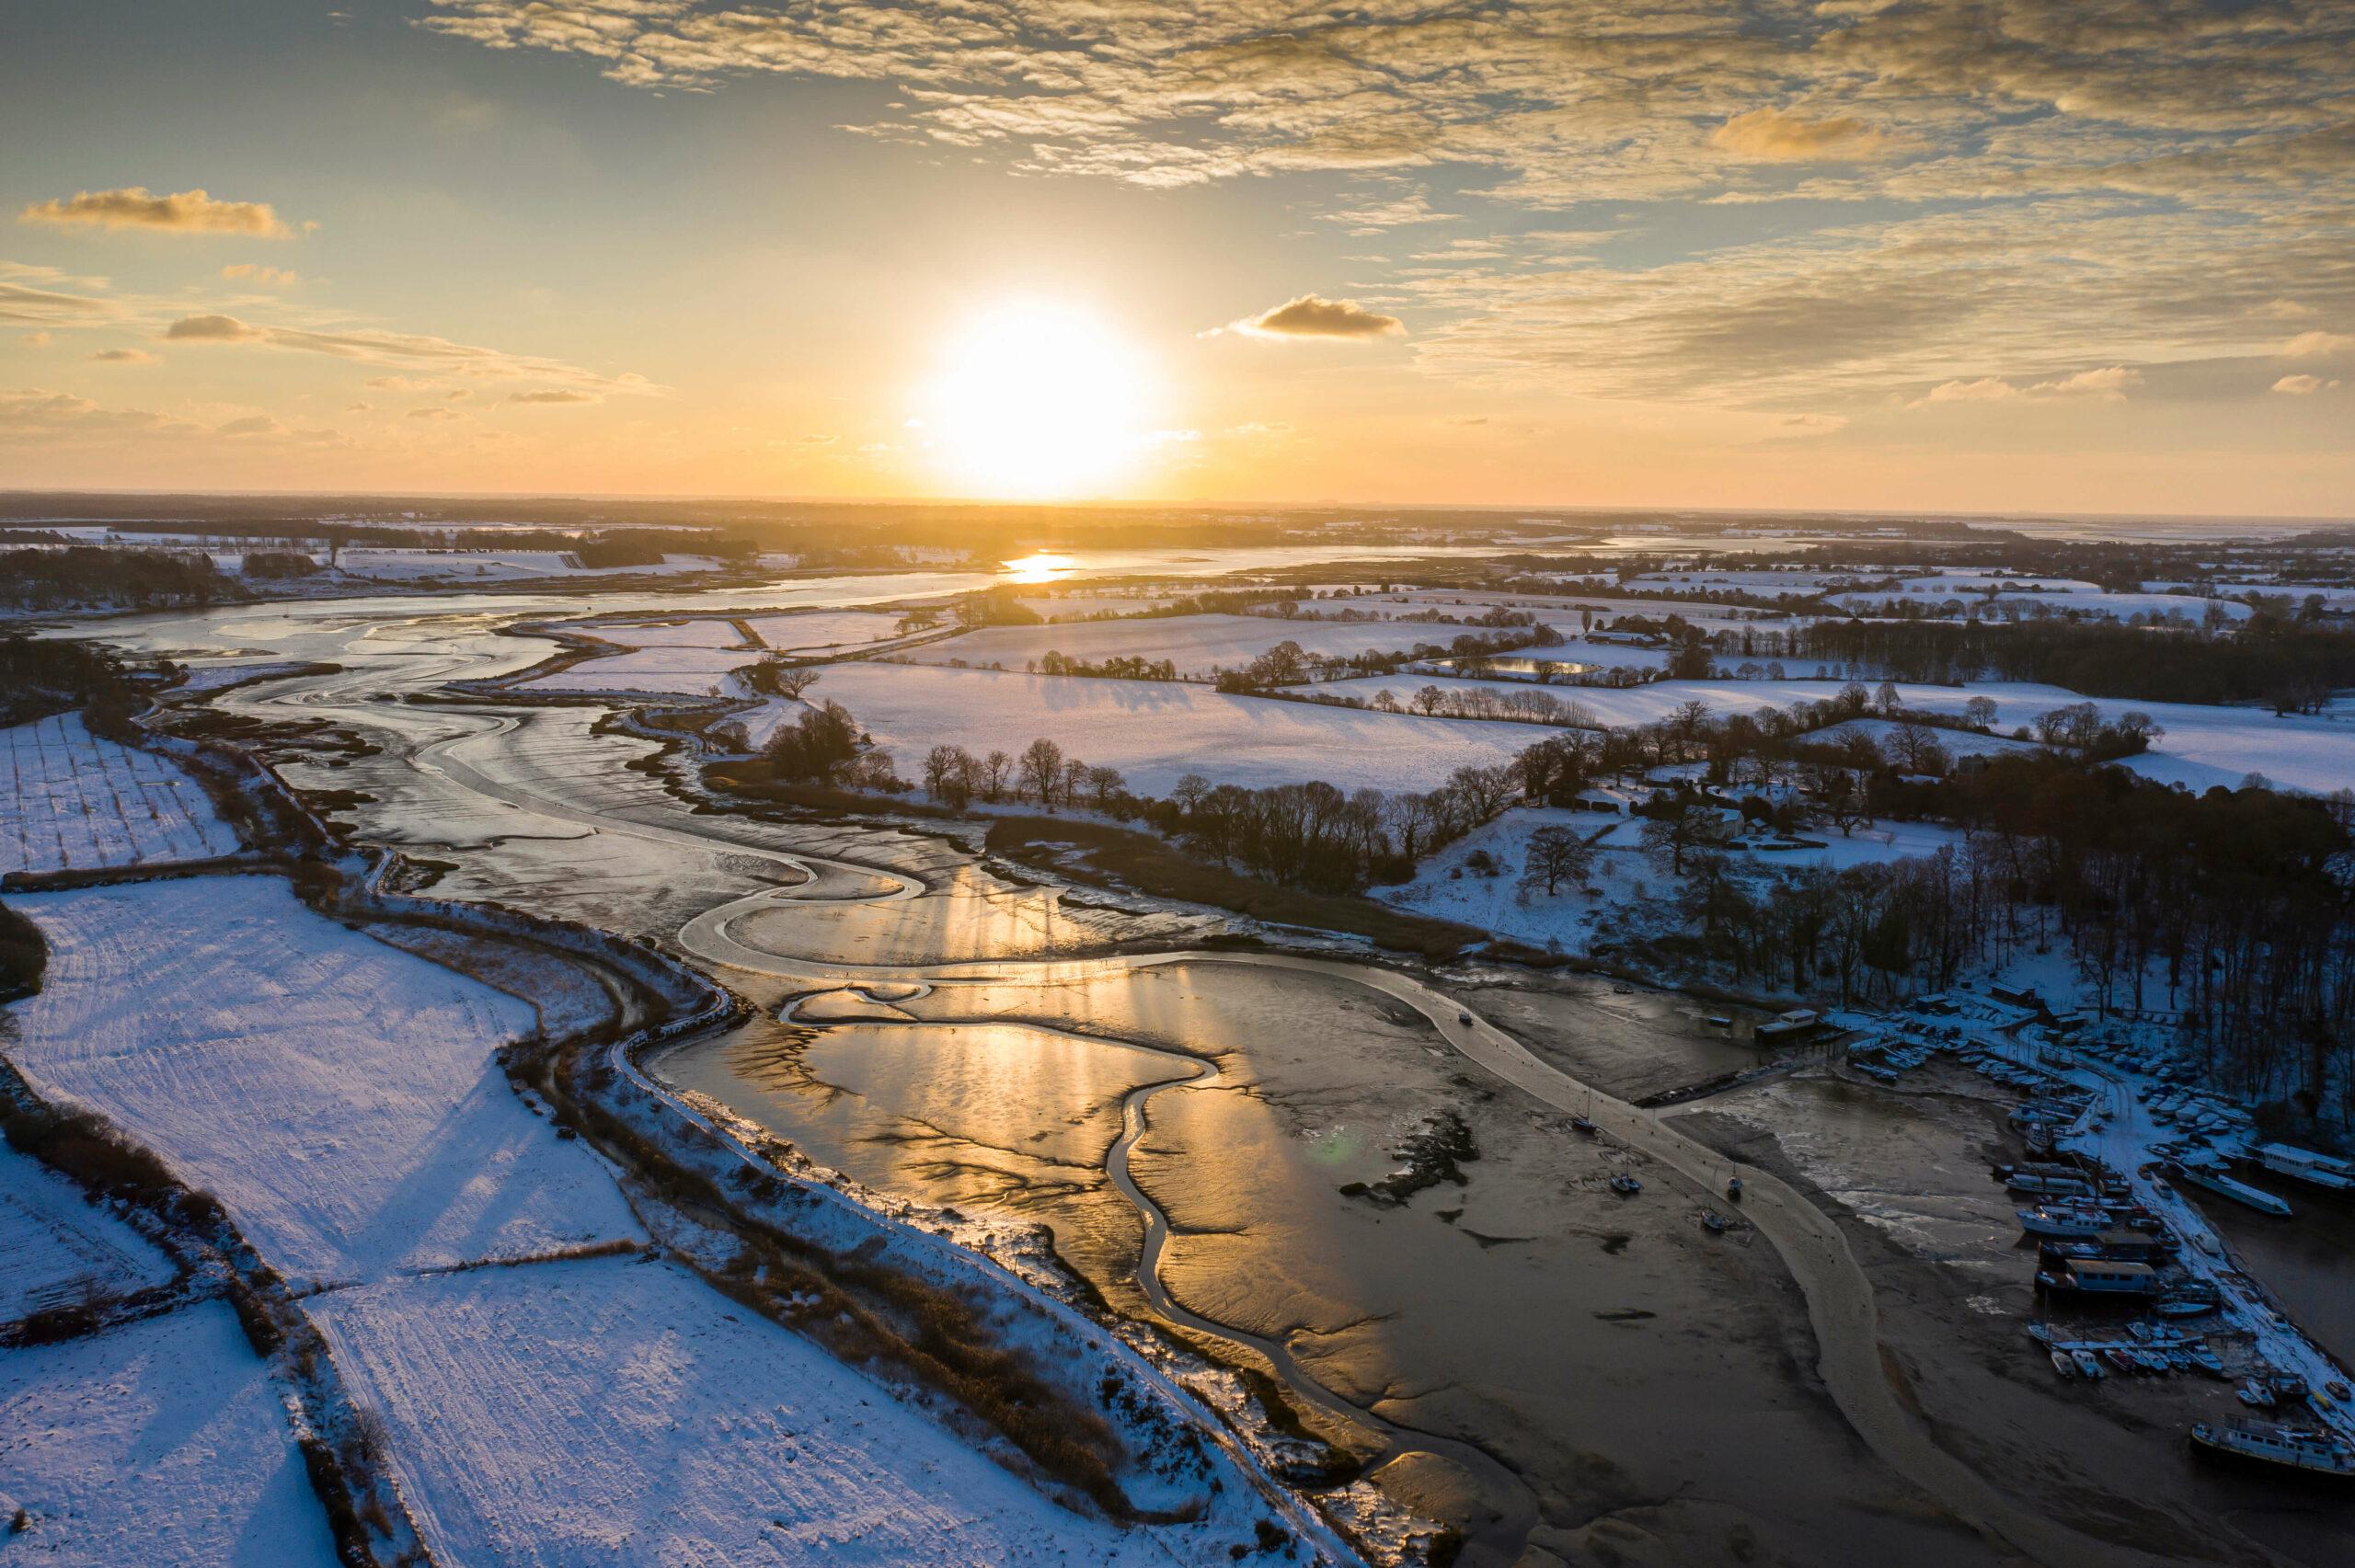 Winter sunrise over the River Deben